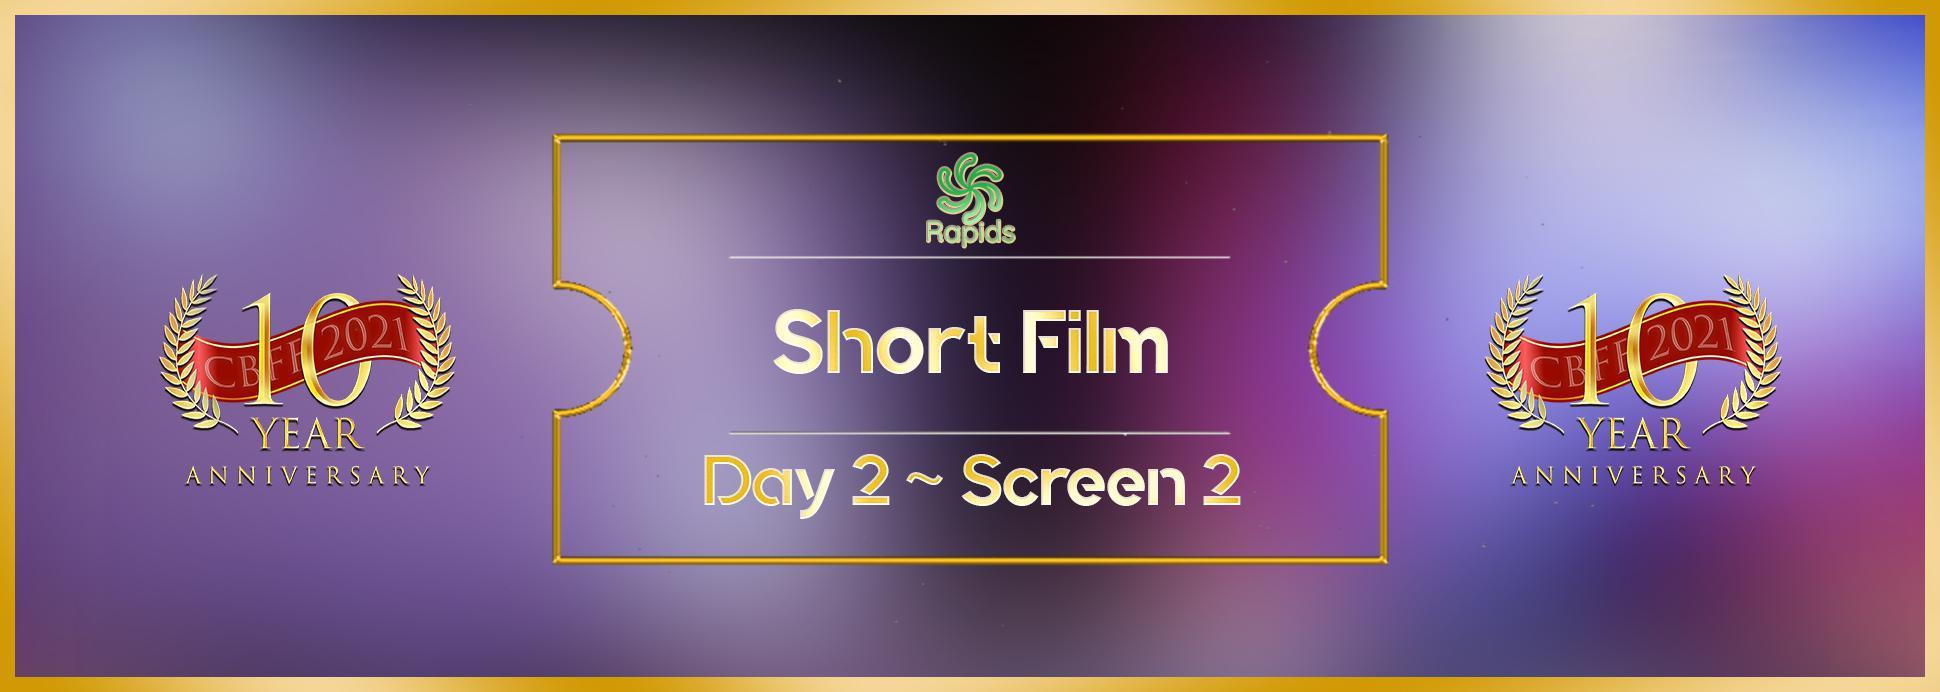 Day 2, Screen 2: Short Film 2